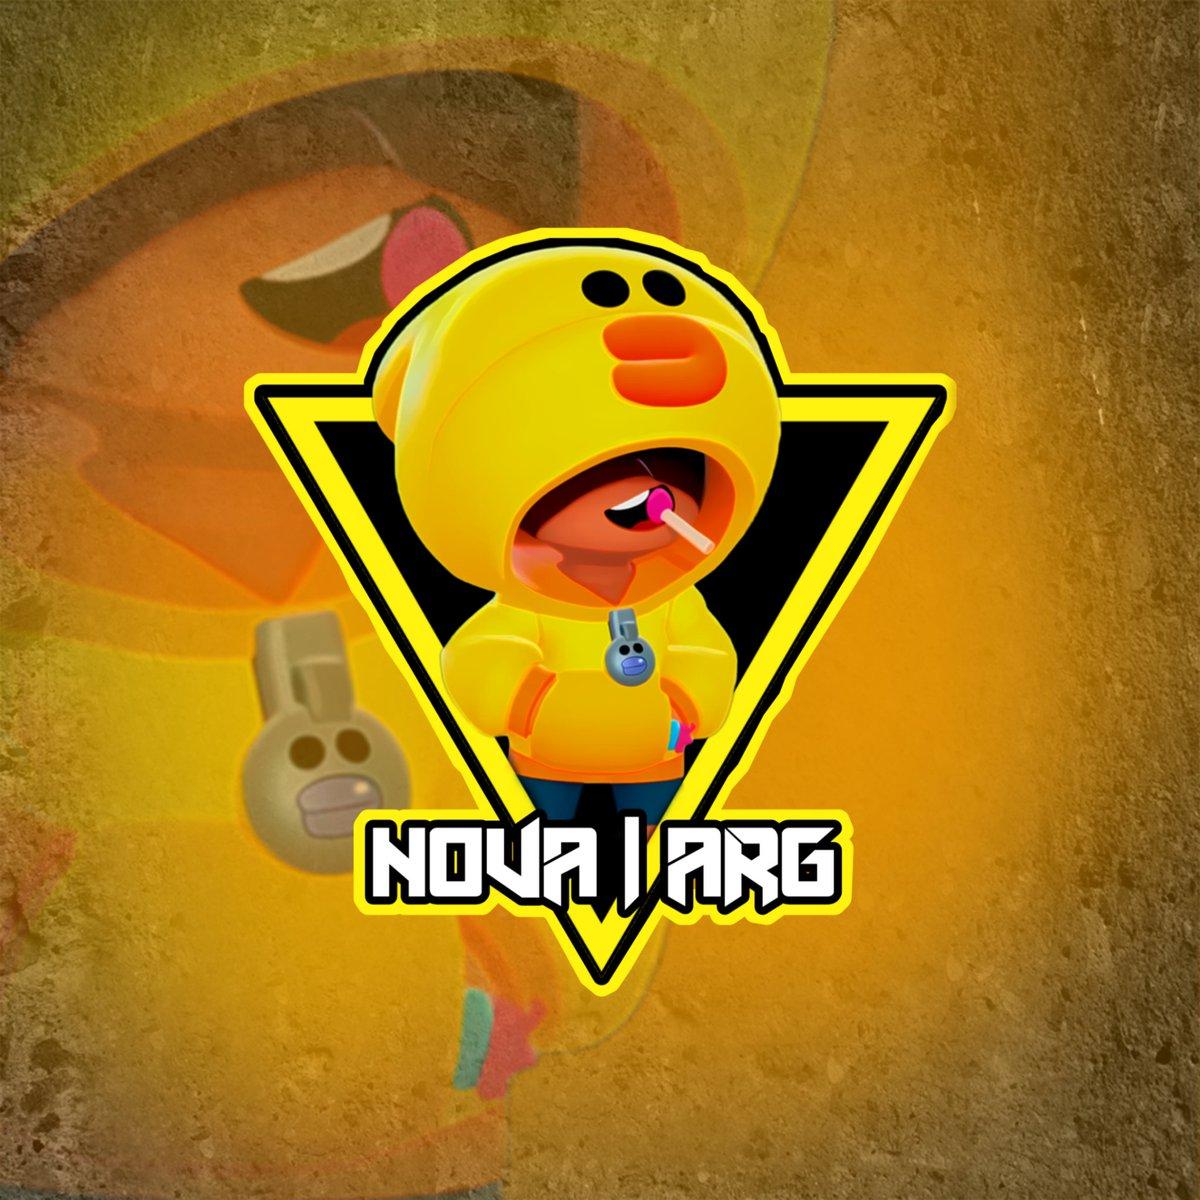 Nueva #FotoDePerfil y #mascotlogo para @NovaIArg5!   Que esperas para pedir tu diseño?  Contactame via Md  para mas info!pic.twitter.com/VTDBXkYRqc